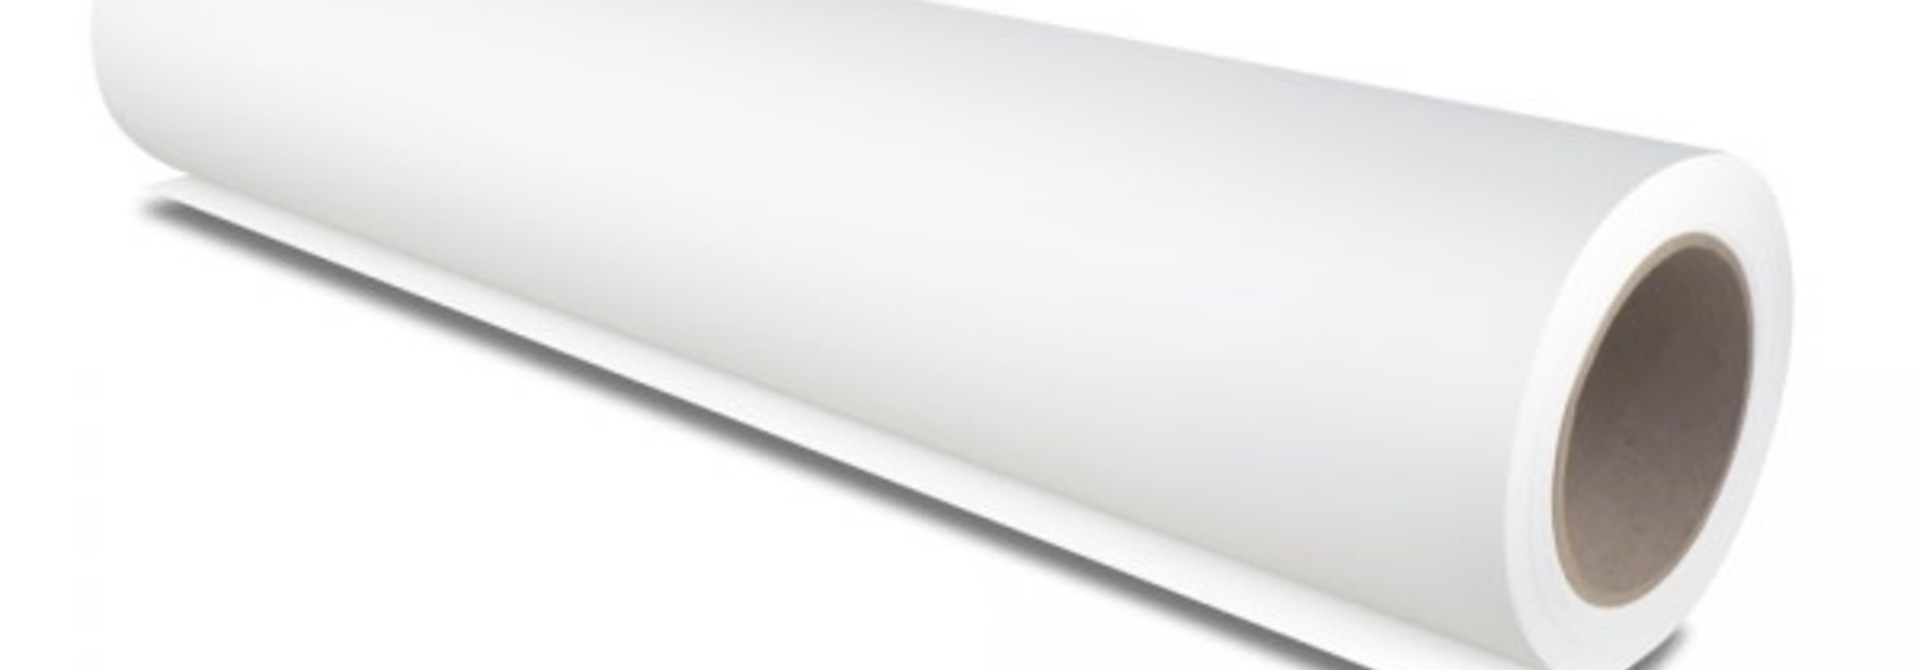 Epson Cold Press Bright 44in Roll per running inch